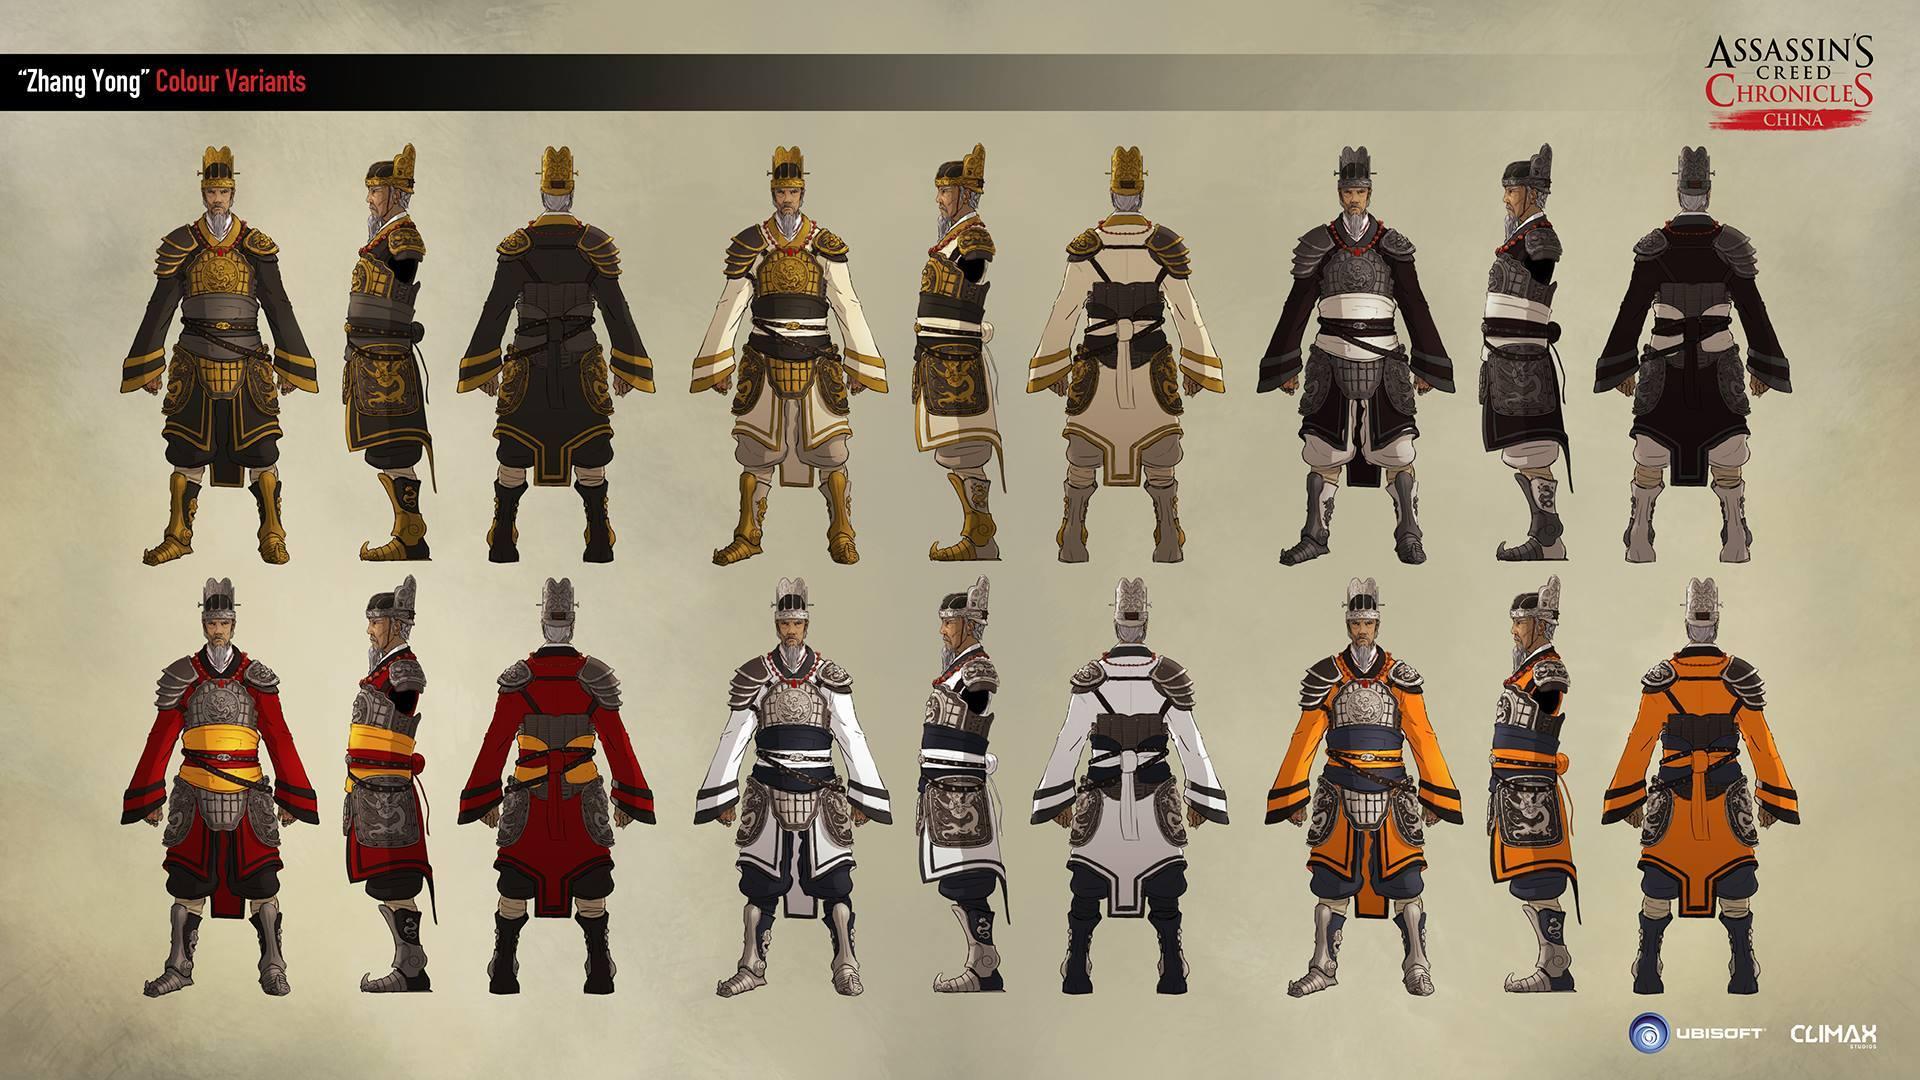 Assassin S Creed Chronicles China Assassin S Creed Wiki Fandom